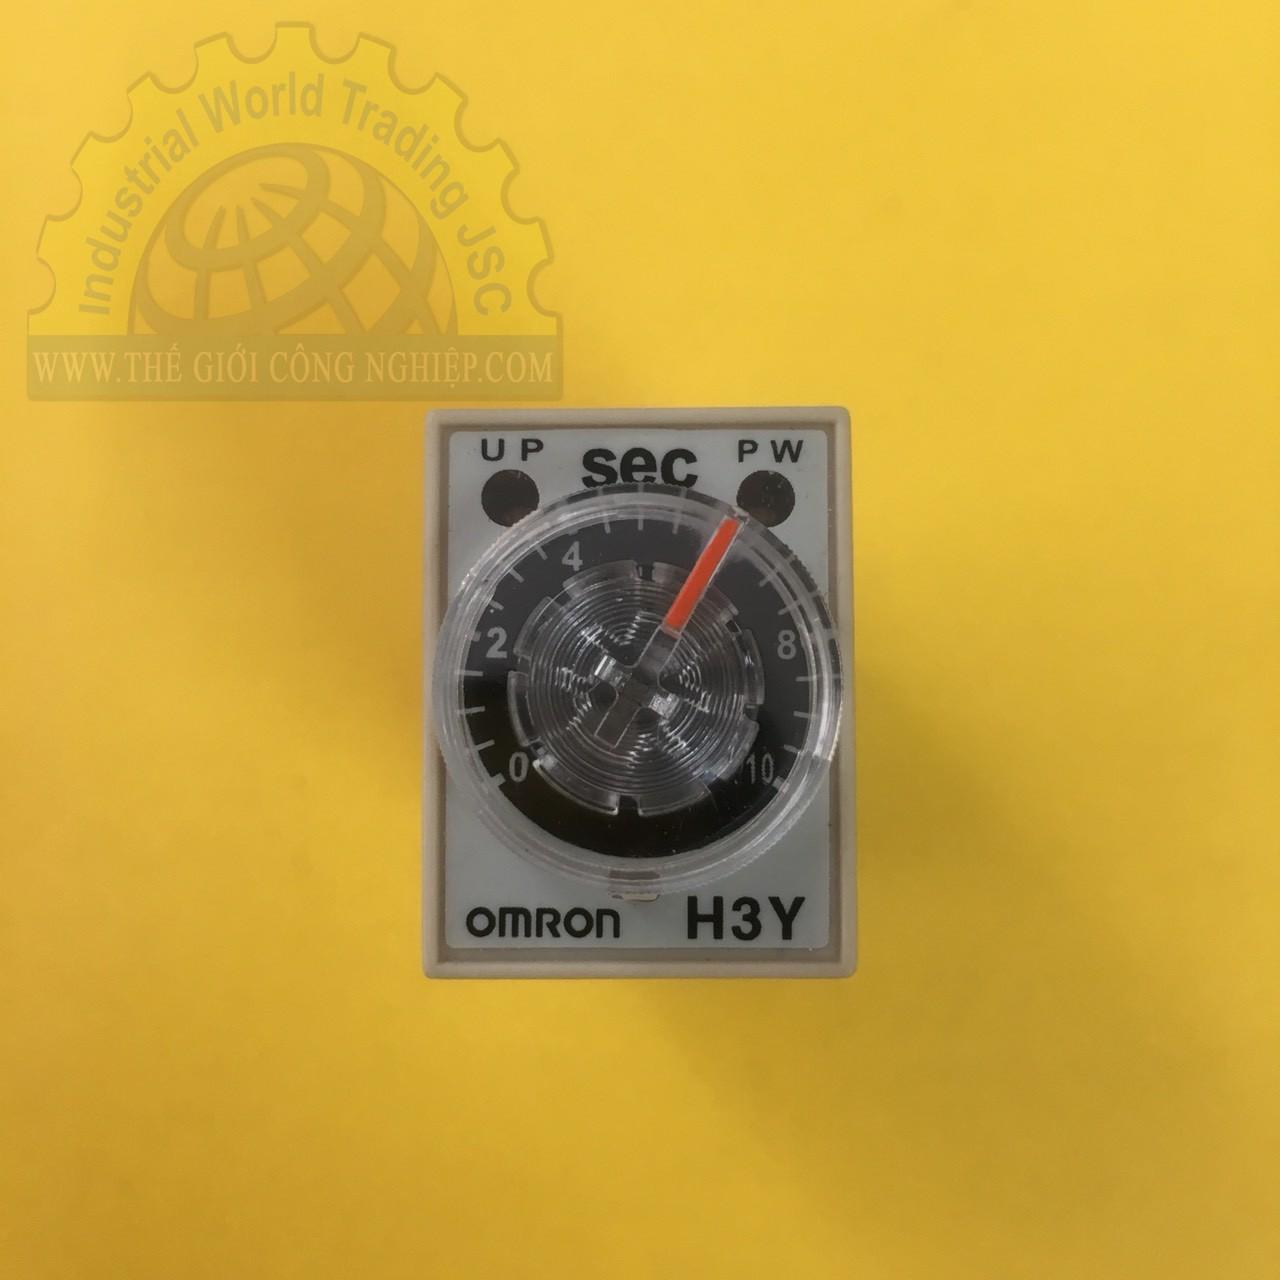 Relay thời gian H3Y-2 AC200-230 10S Omron